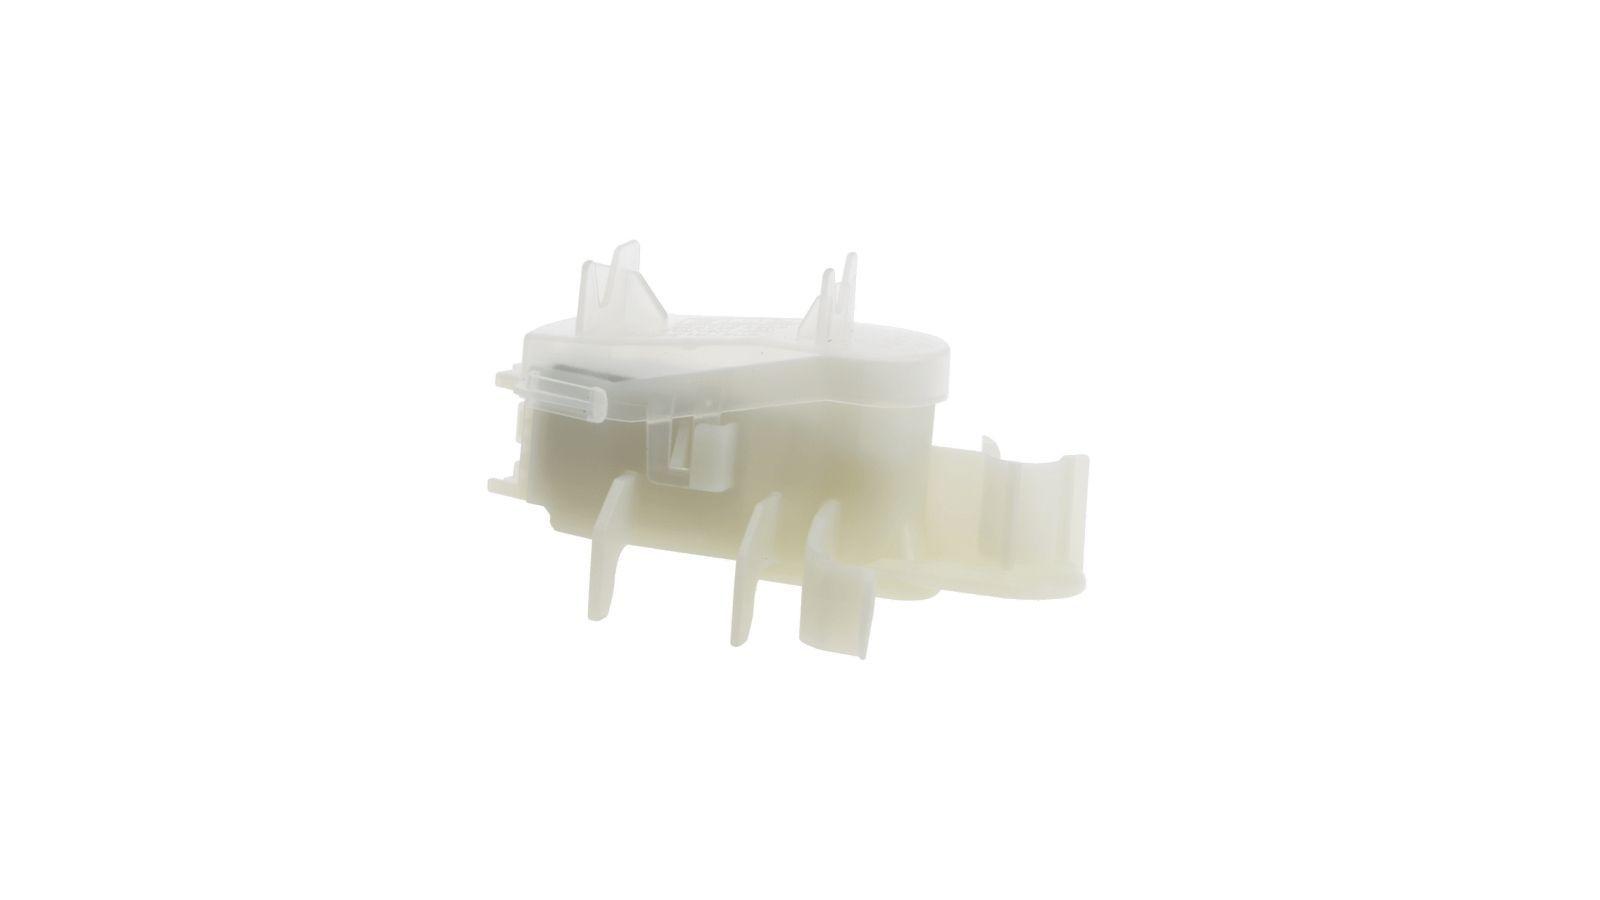 Door Switch for Bosch Siemens Tumble Dryers - 00623850 BSH - Bosch / Siemens